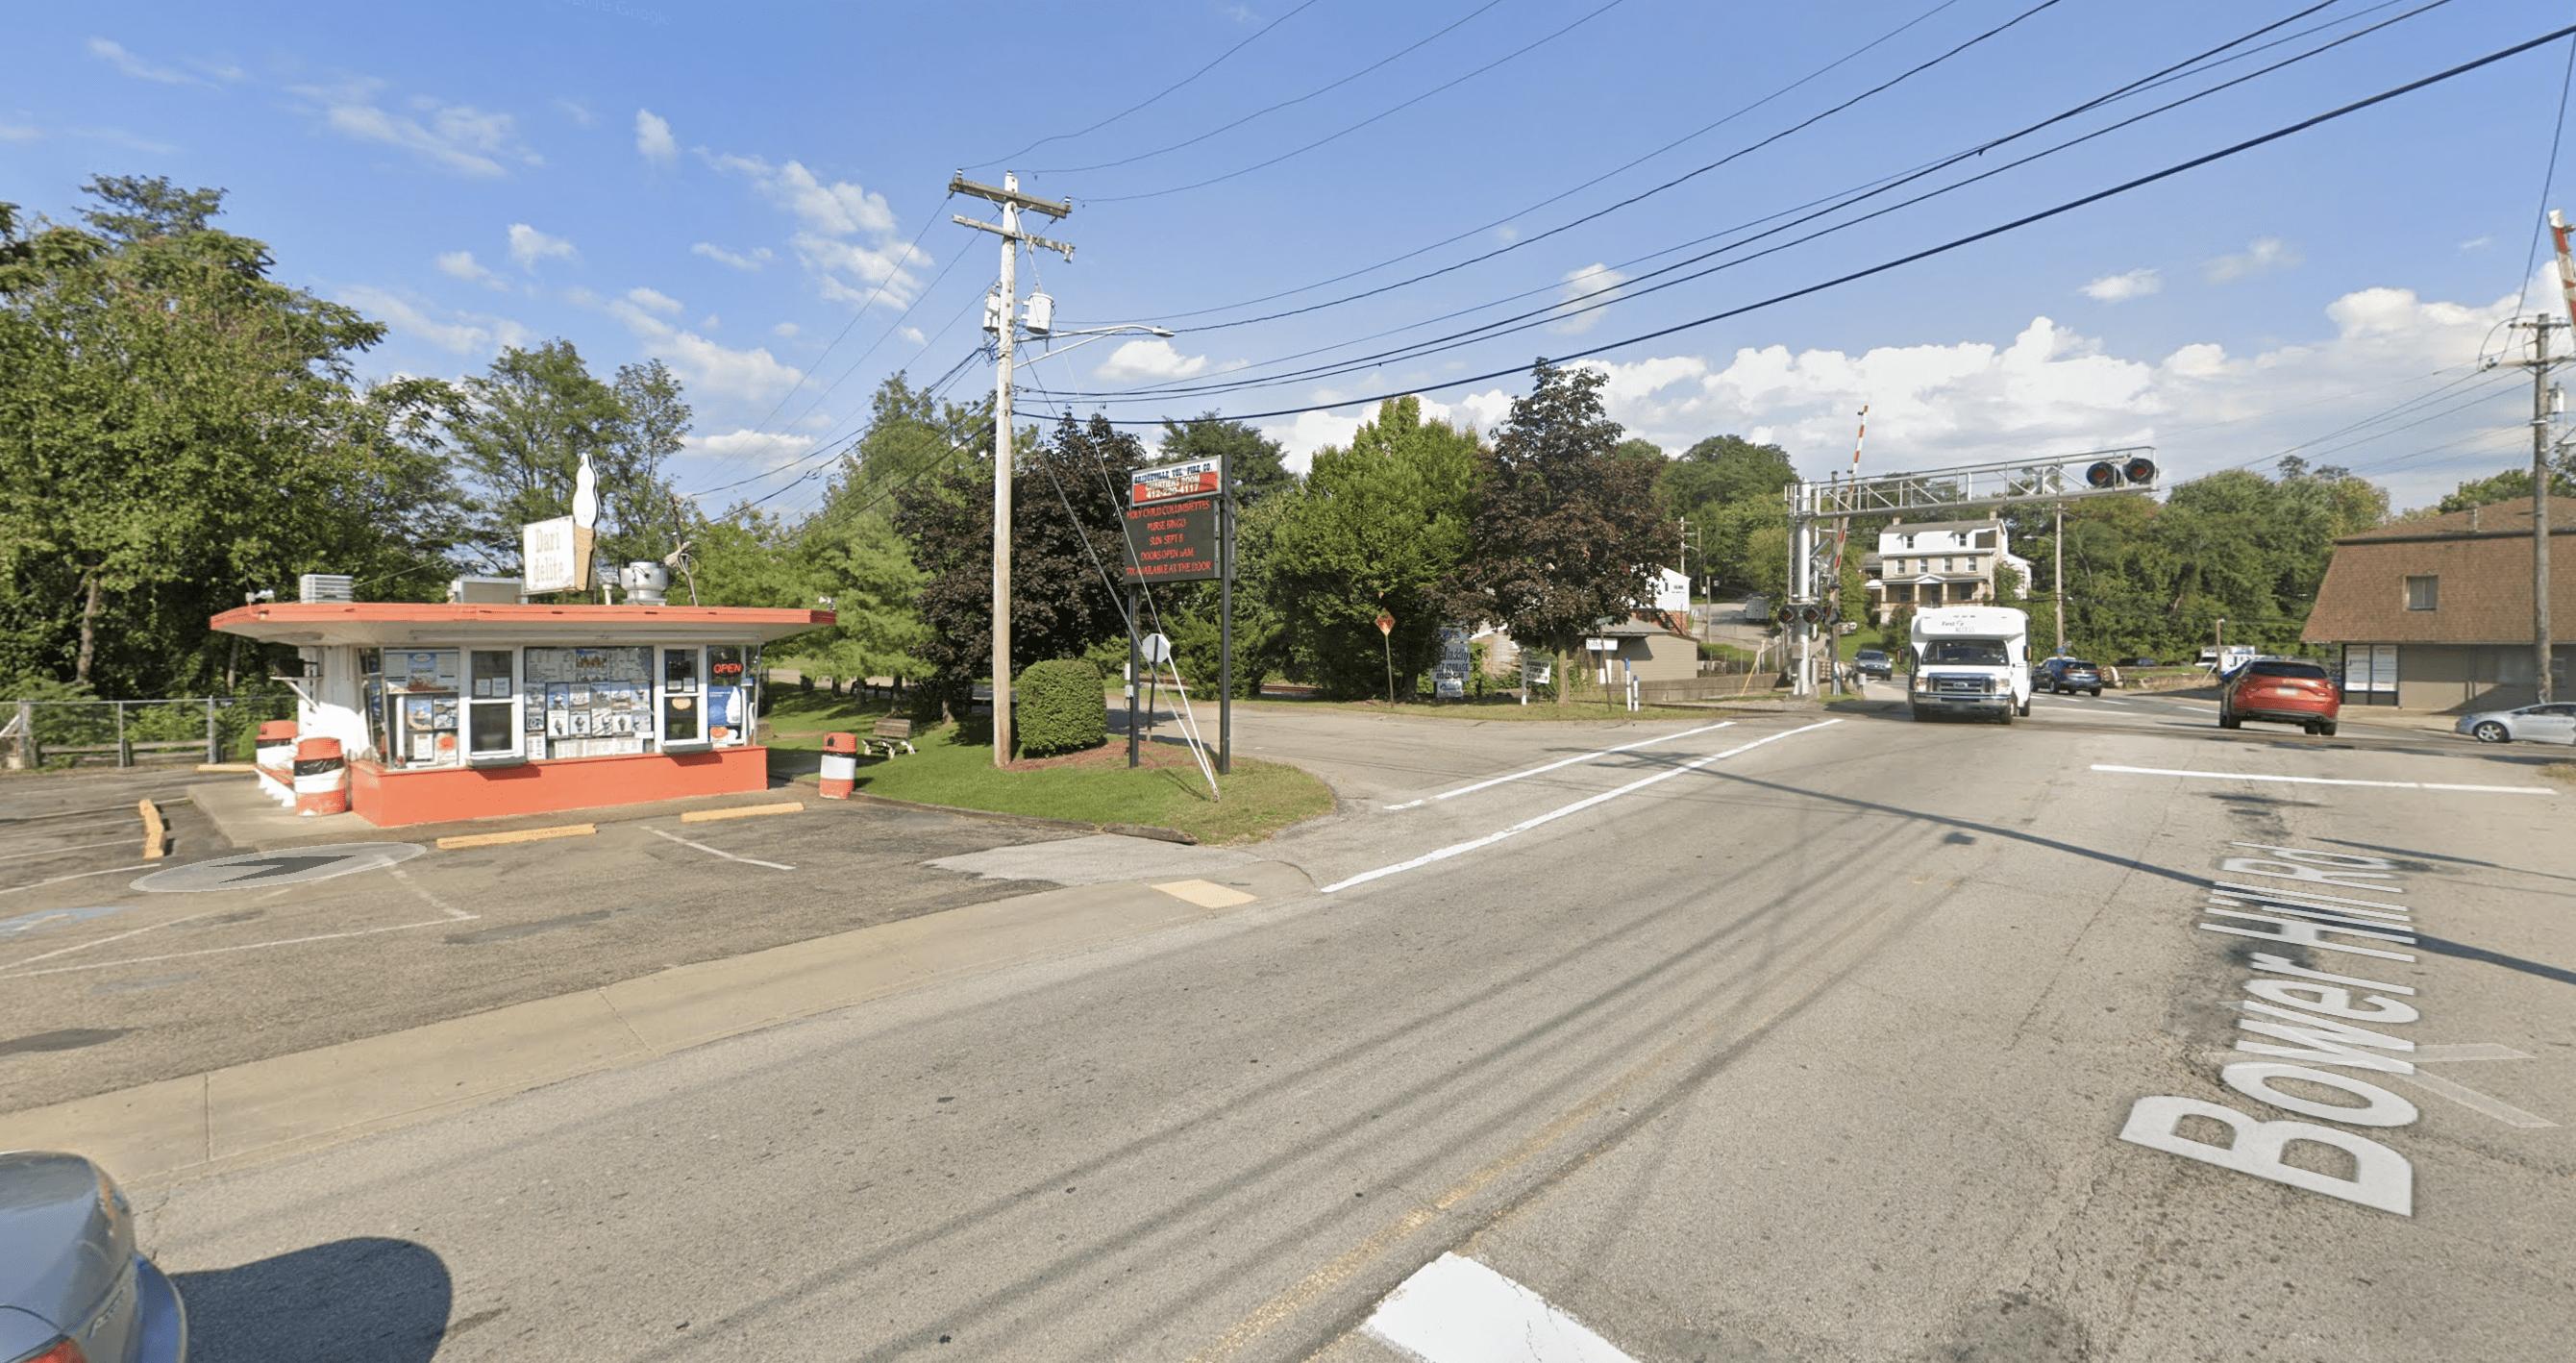 Crossing to street Bower Hill Road near the Dari-Delite in Bridgeville is always an adventure.